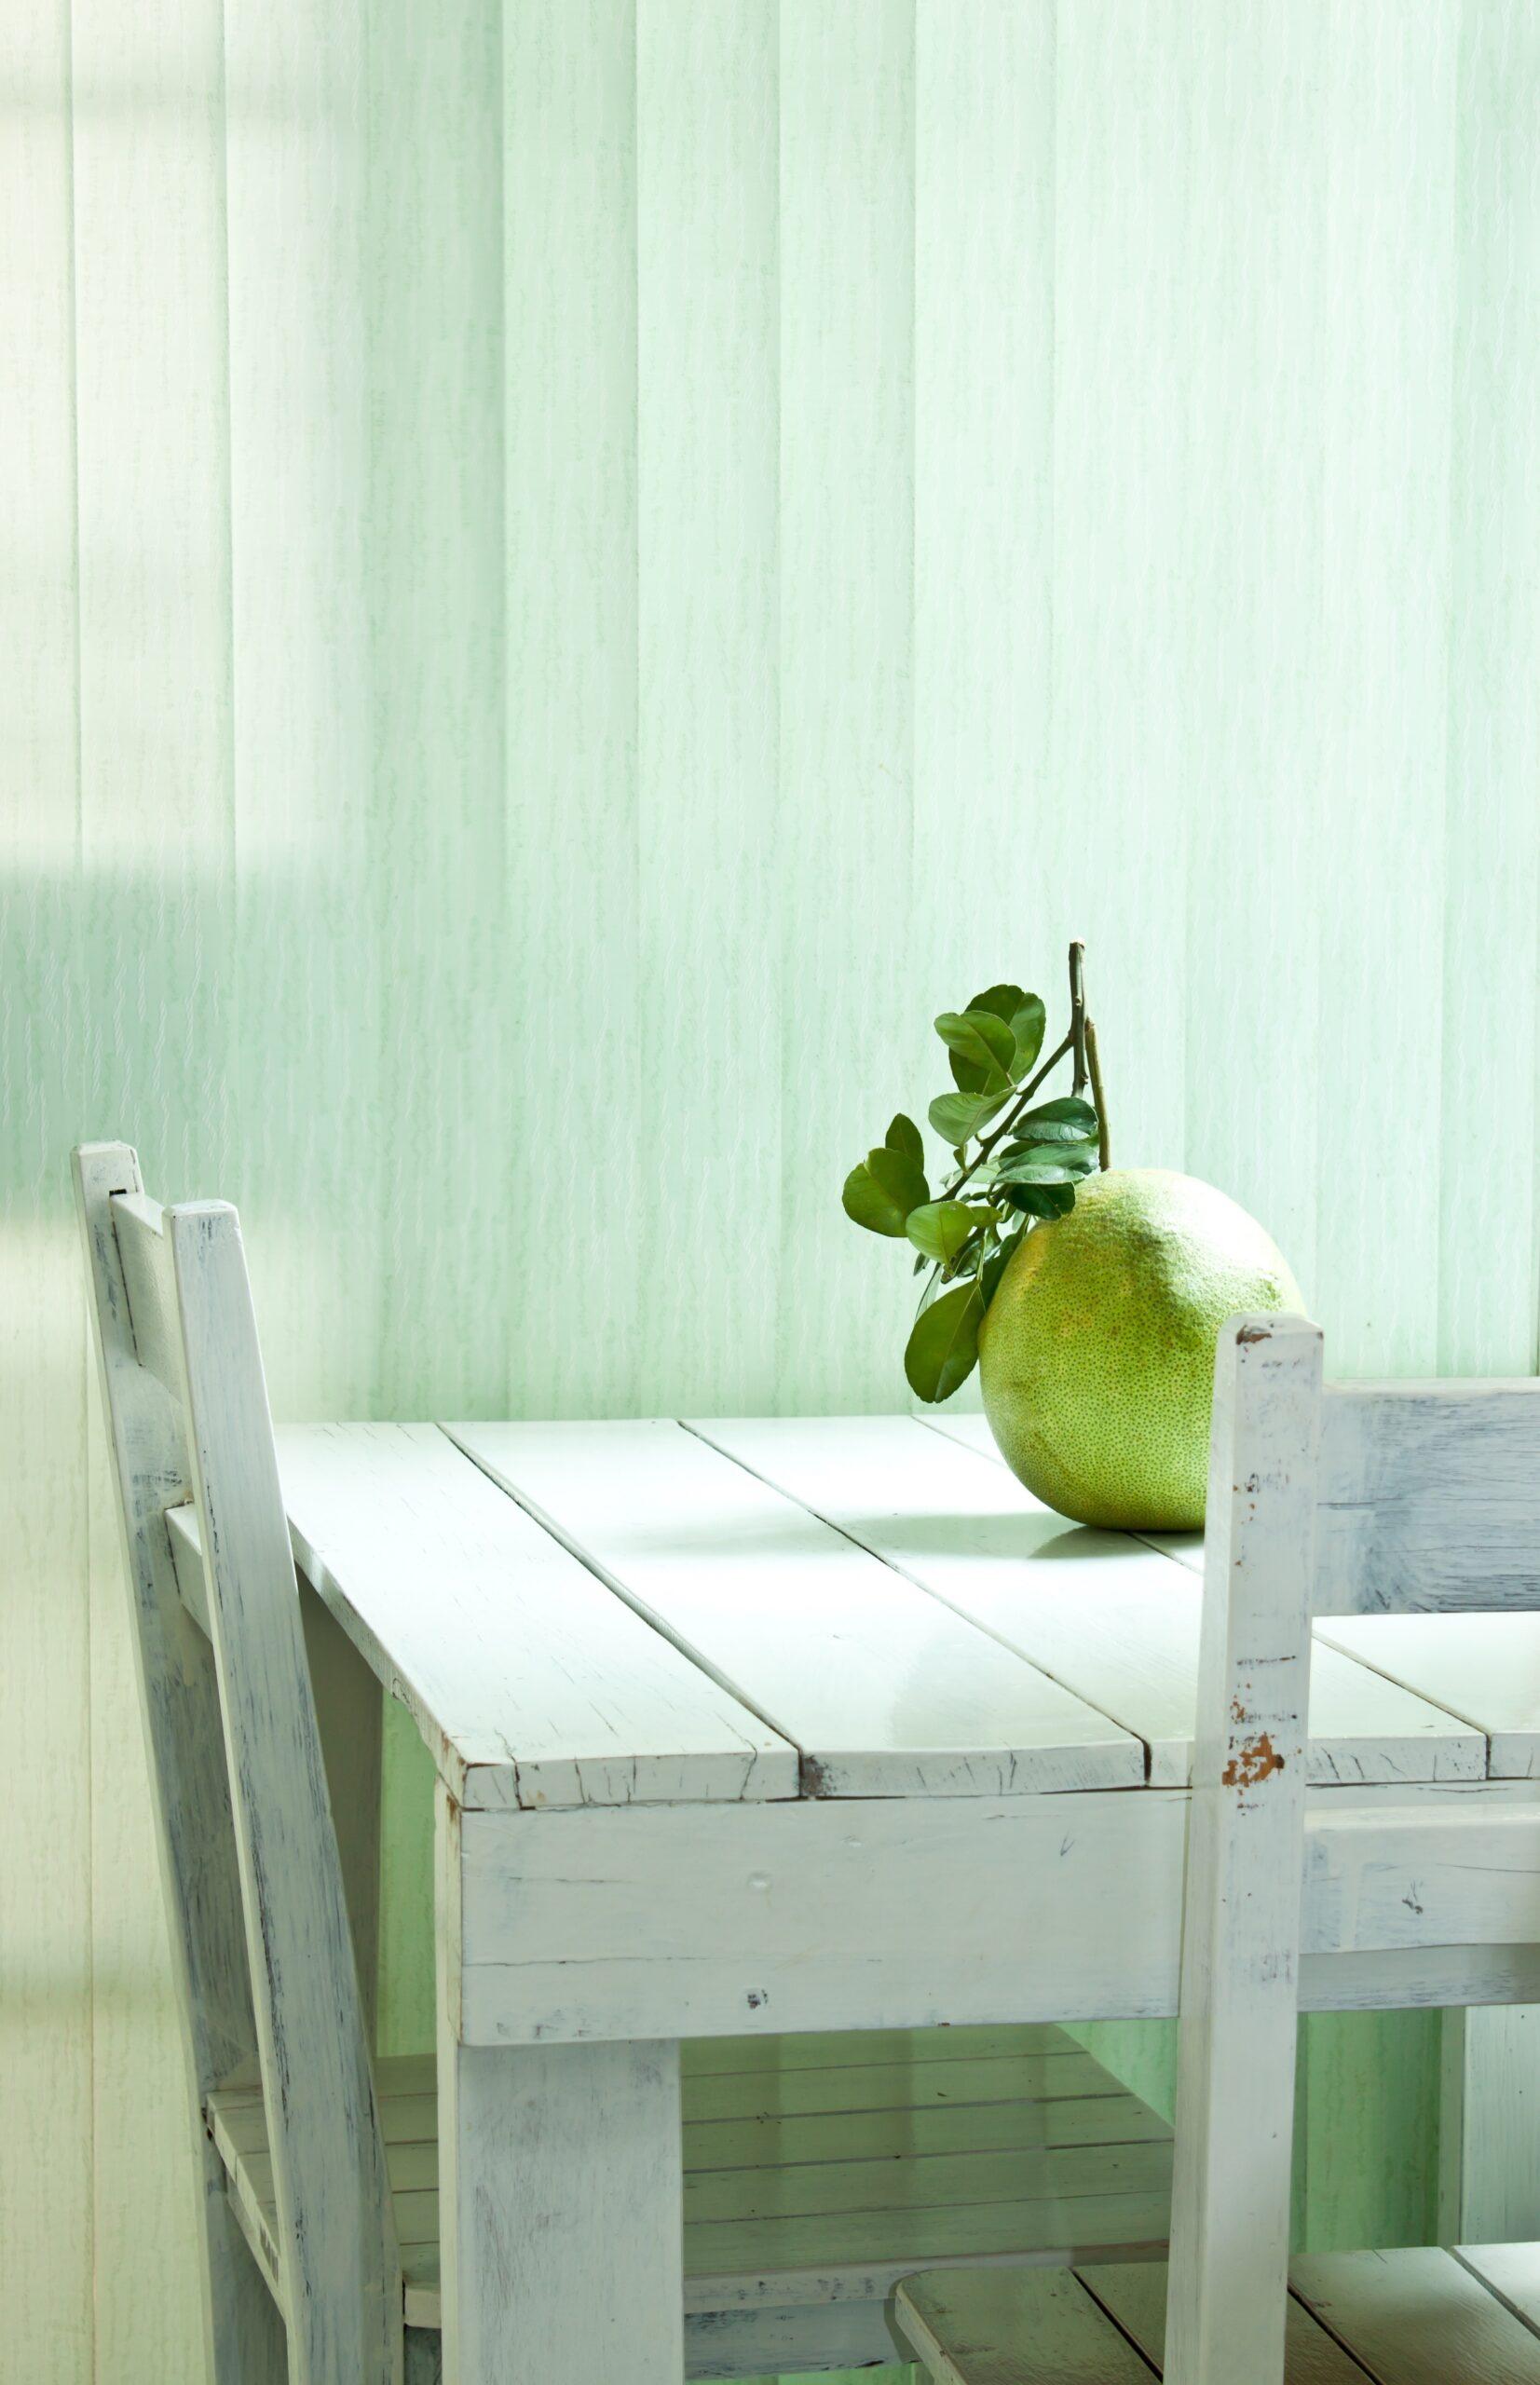 Hochwertiger Sonnenschutz, Sichtschutz und Lichtschutz - Lamellenvorhang - Senkrechtlamellen - Lamellenvorhang - Dr. Haller + Co. - Selastore®